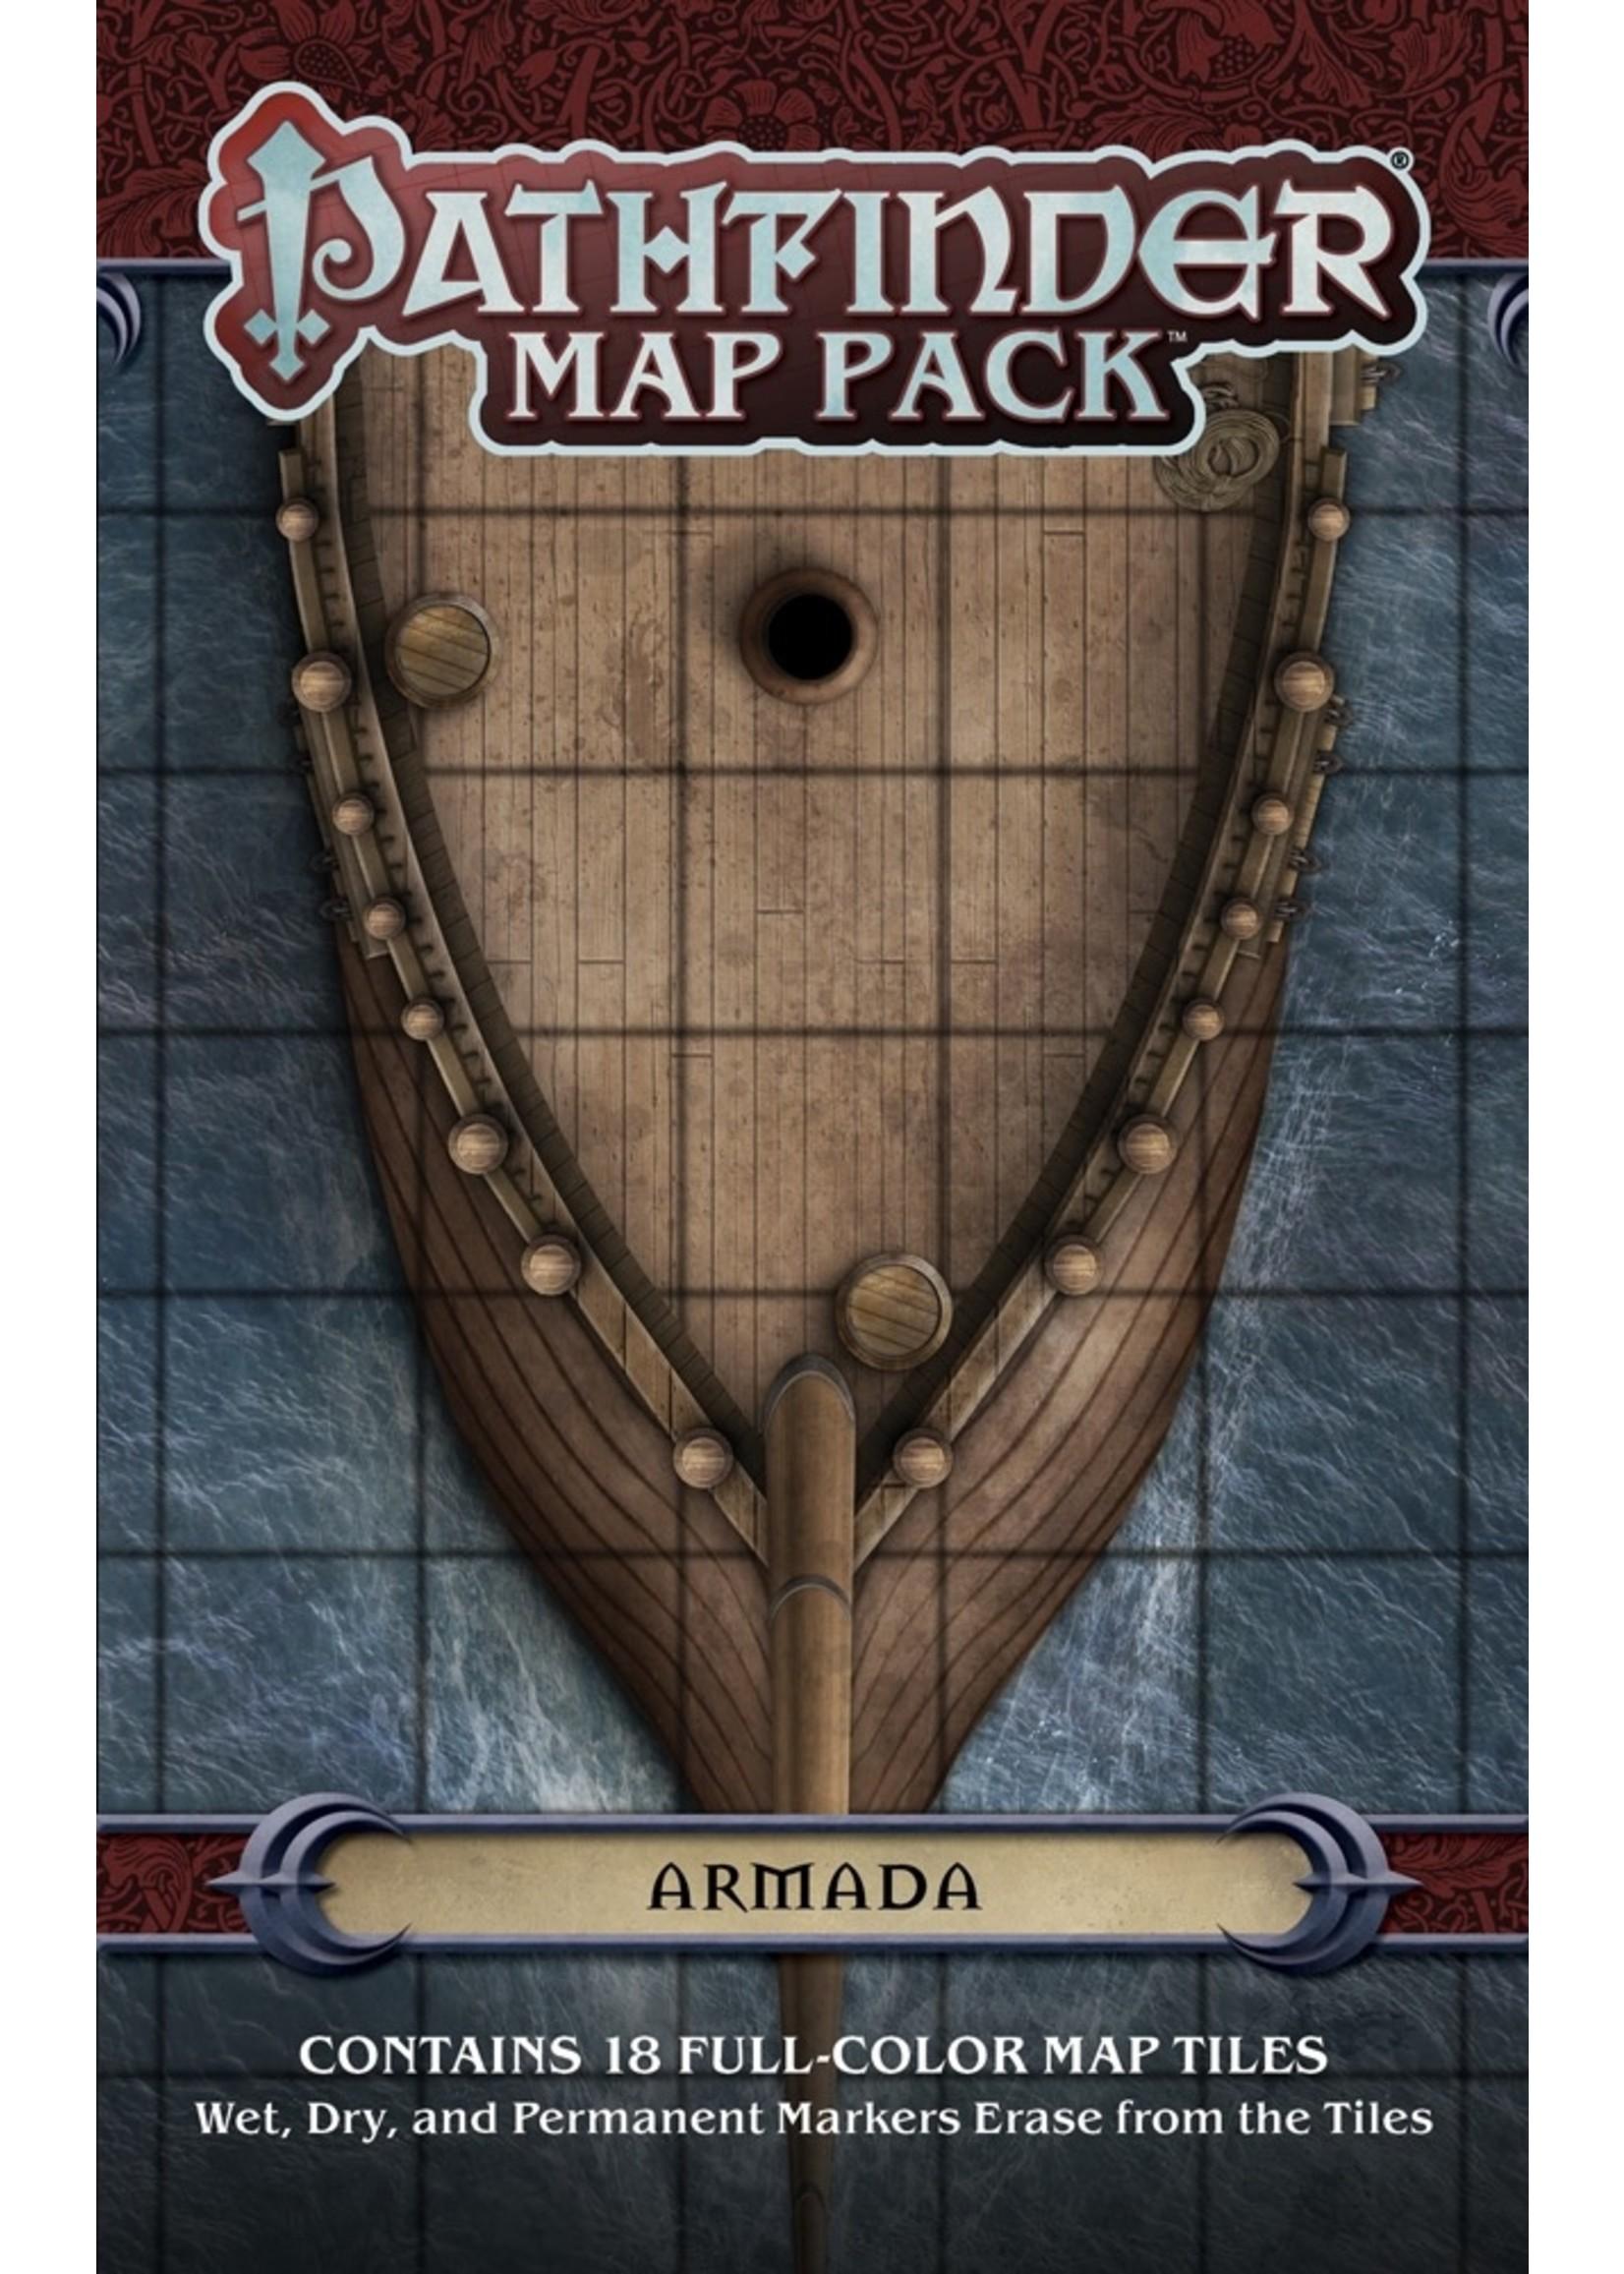 Pathfinder RPG: Map Pack - Armada